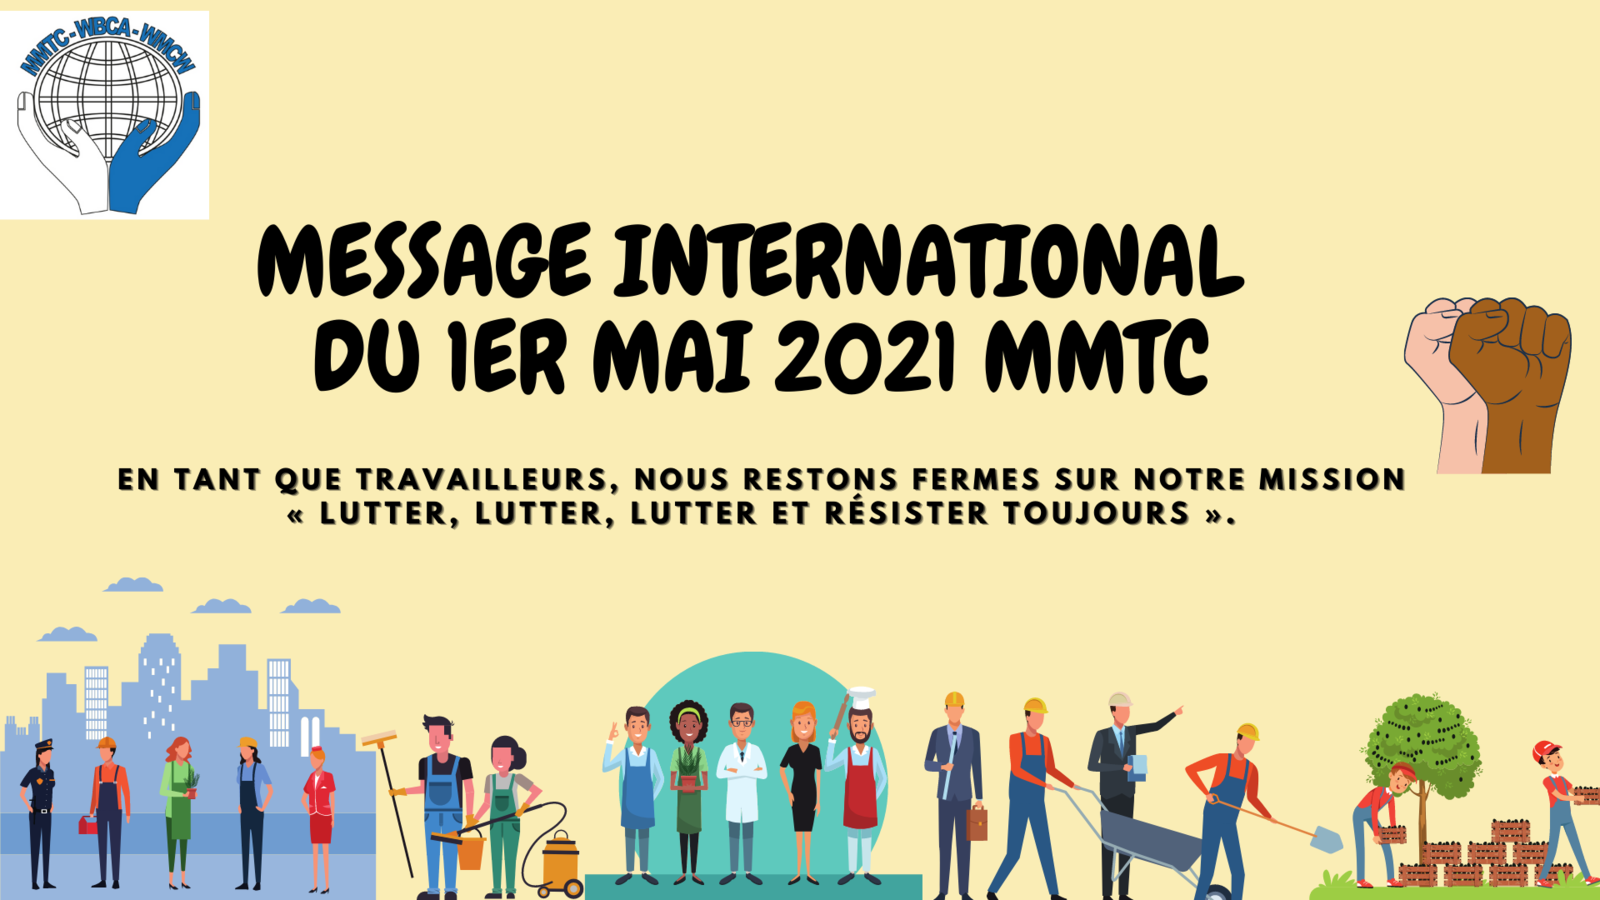 Premier Mai 2021: message international du MMTC